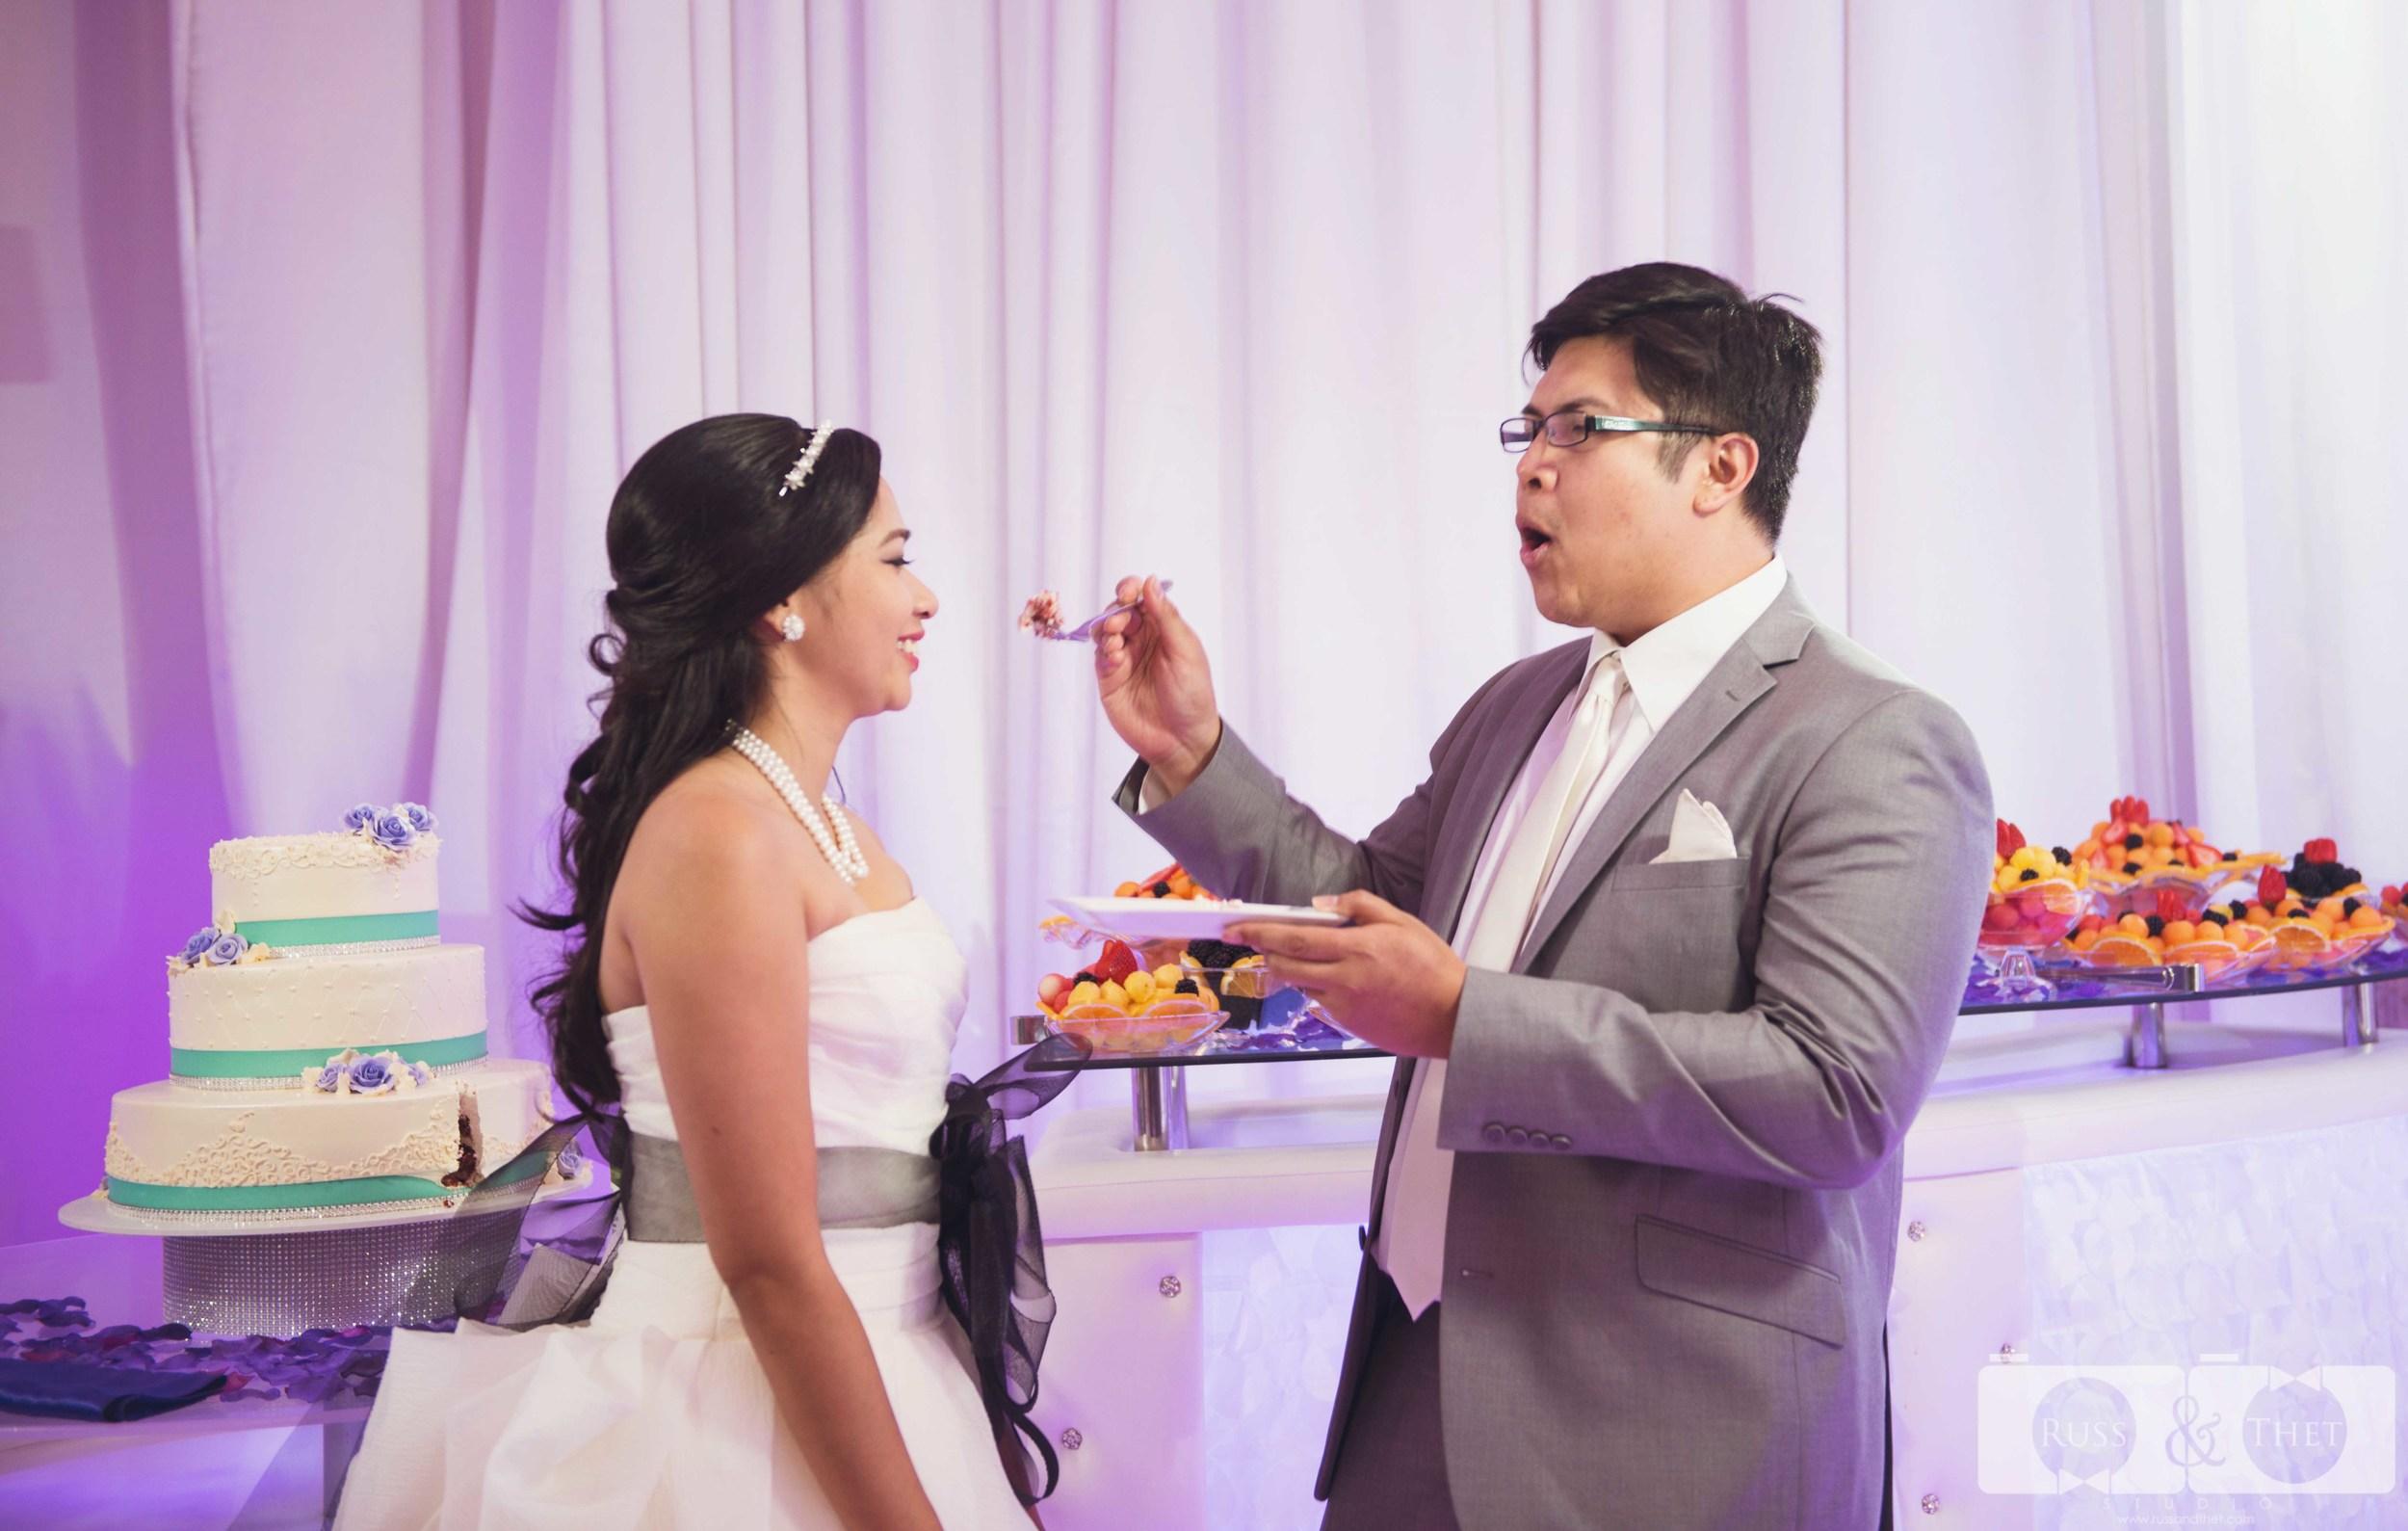 royal-palace-banquet-hall-glendale-wedding-64.JPG